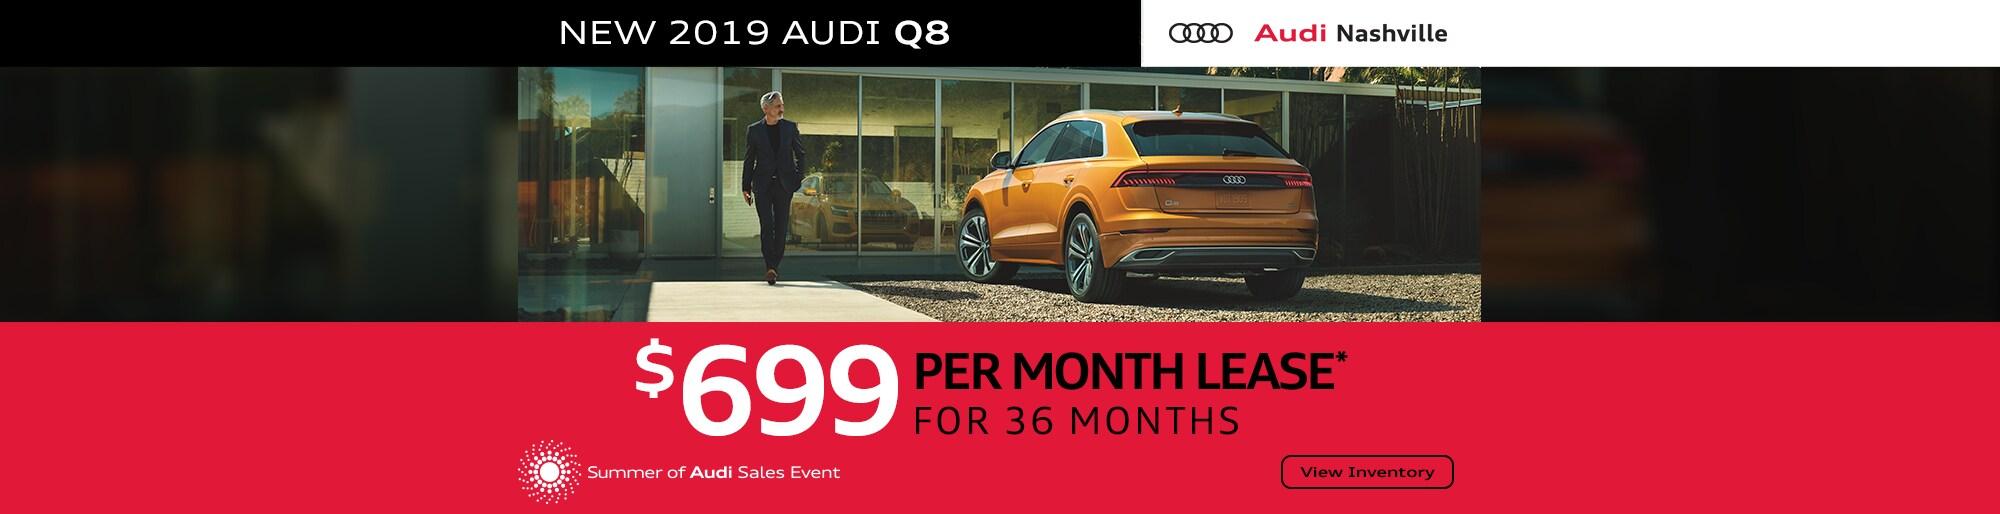 New & Used Audi Vehicles | Audi Nashville Serving Brentwood TN